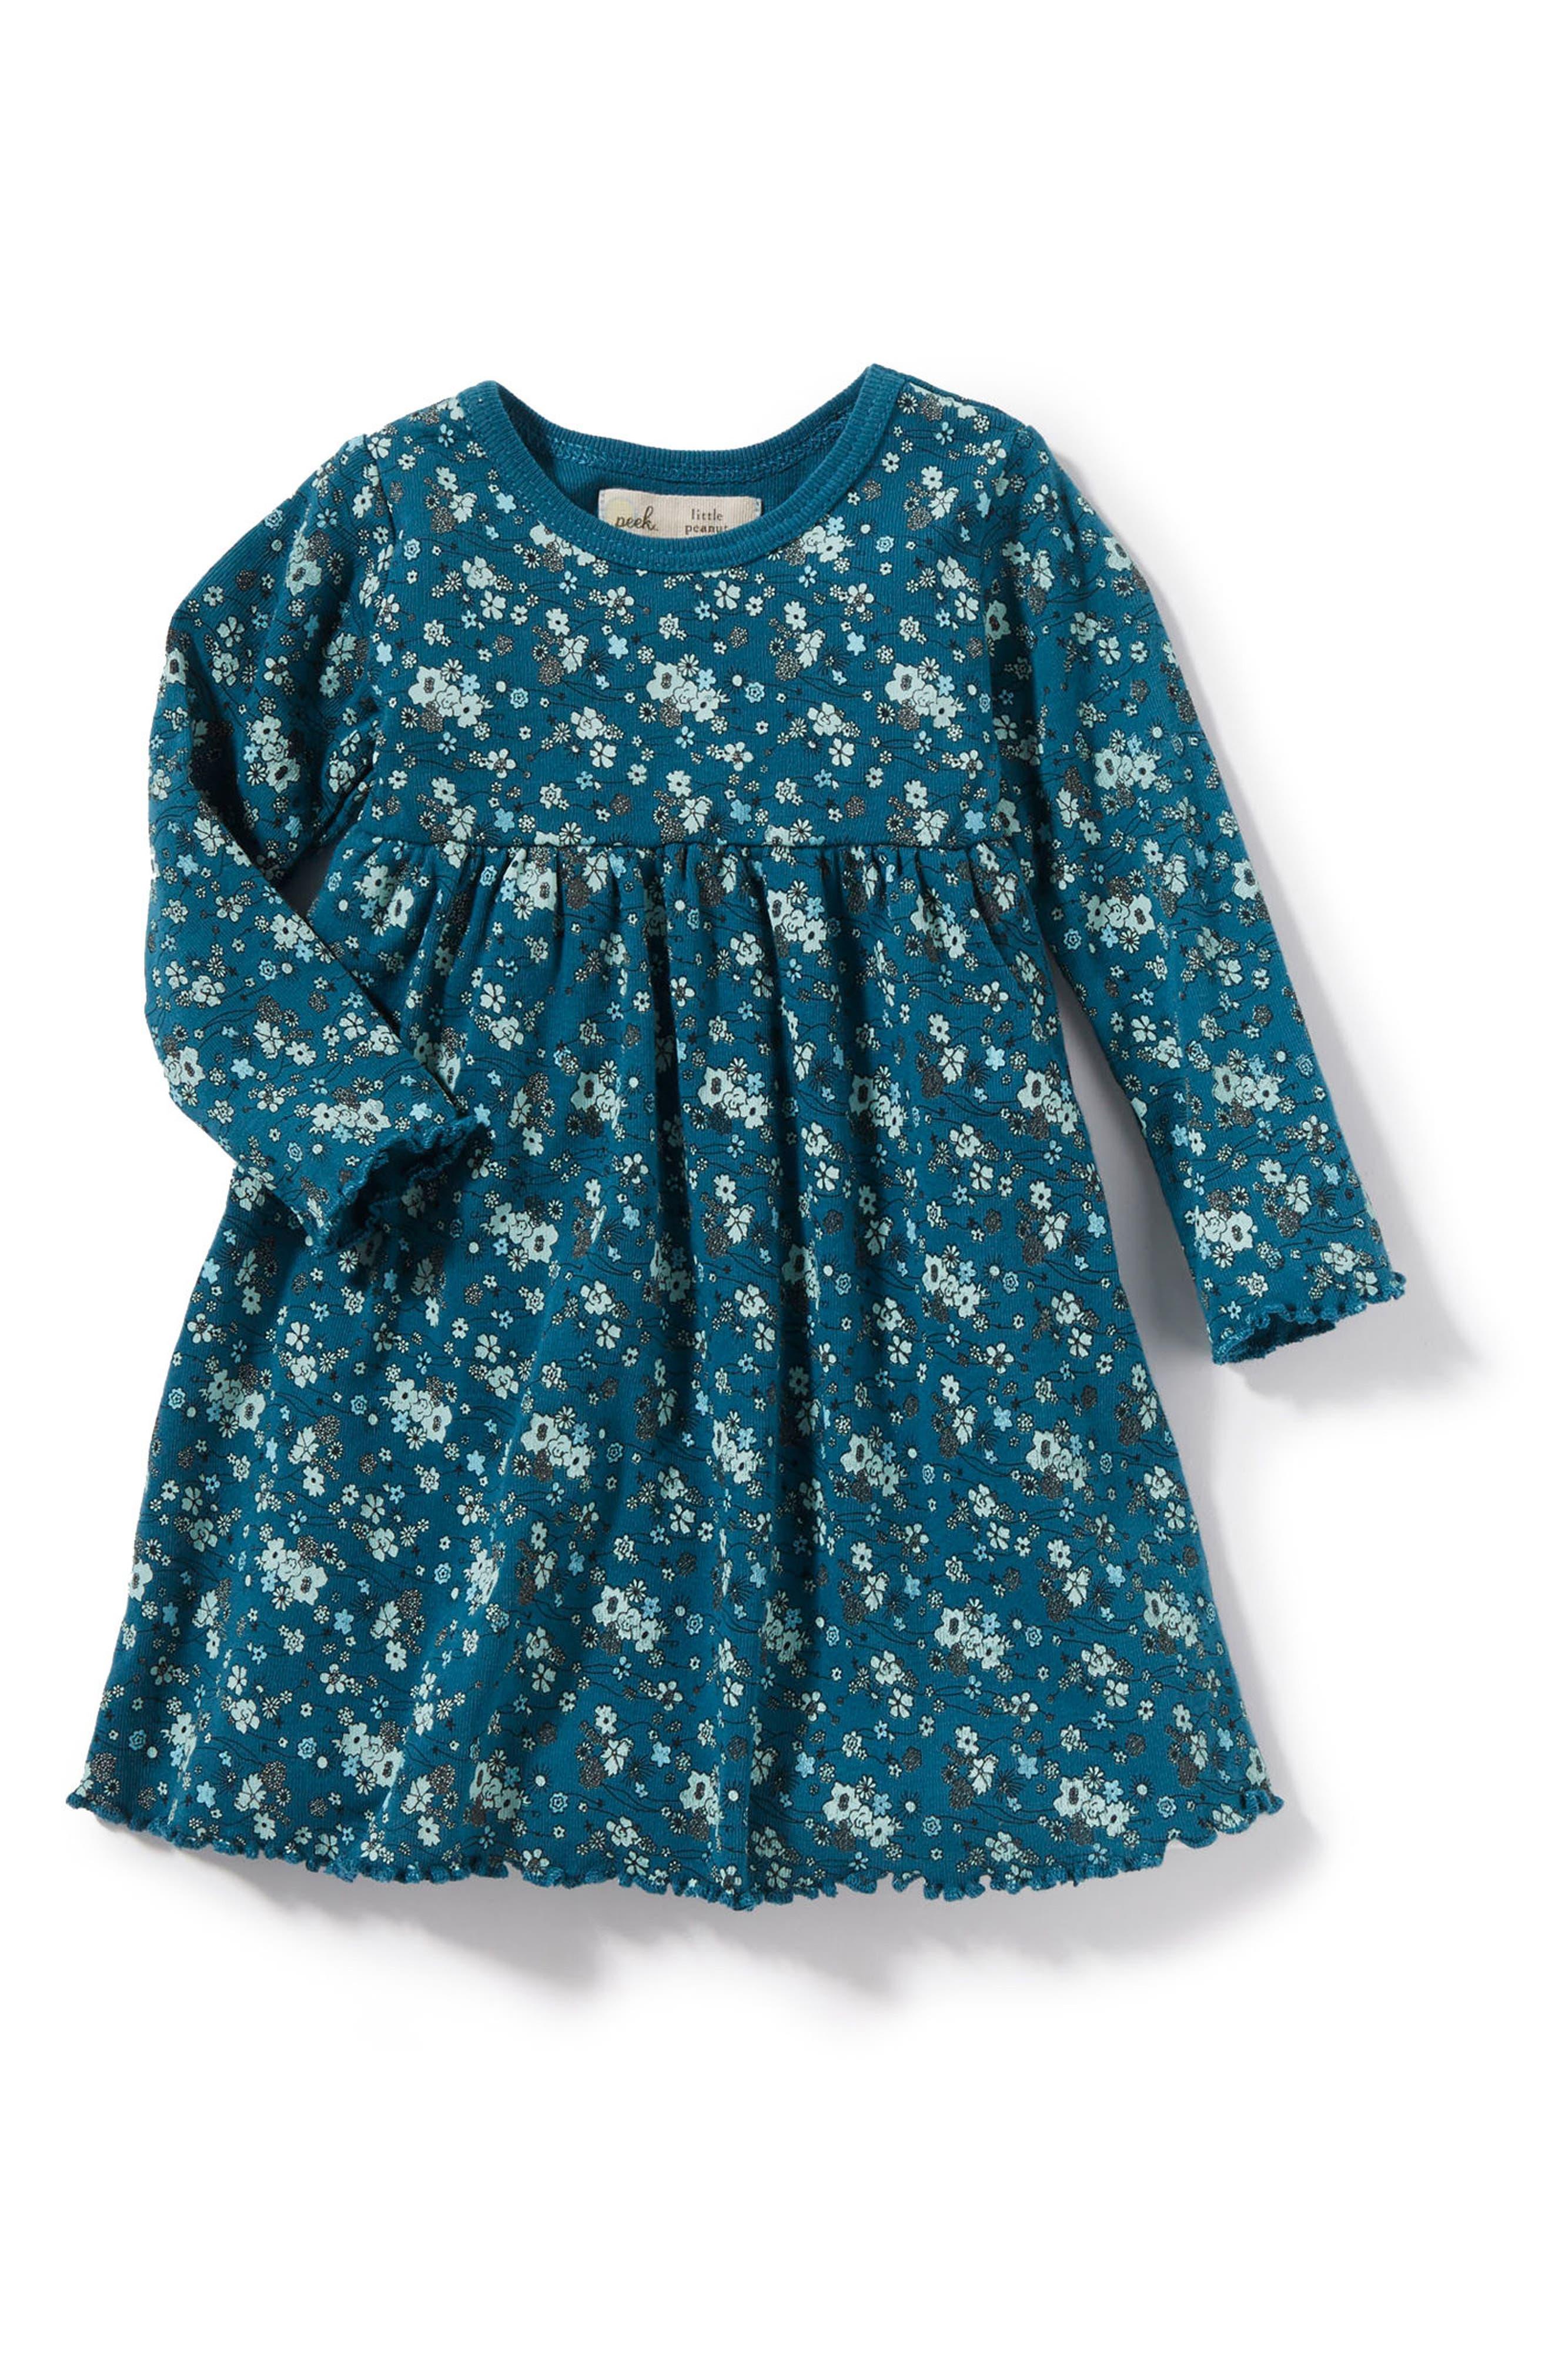 Peek Floral Print Dress,                         Main,                         color, Teal